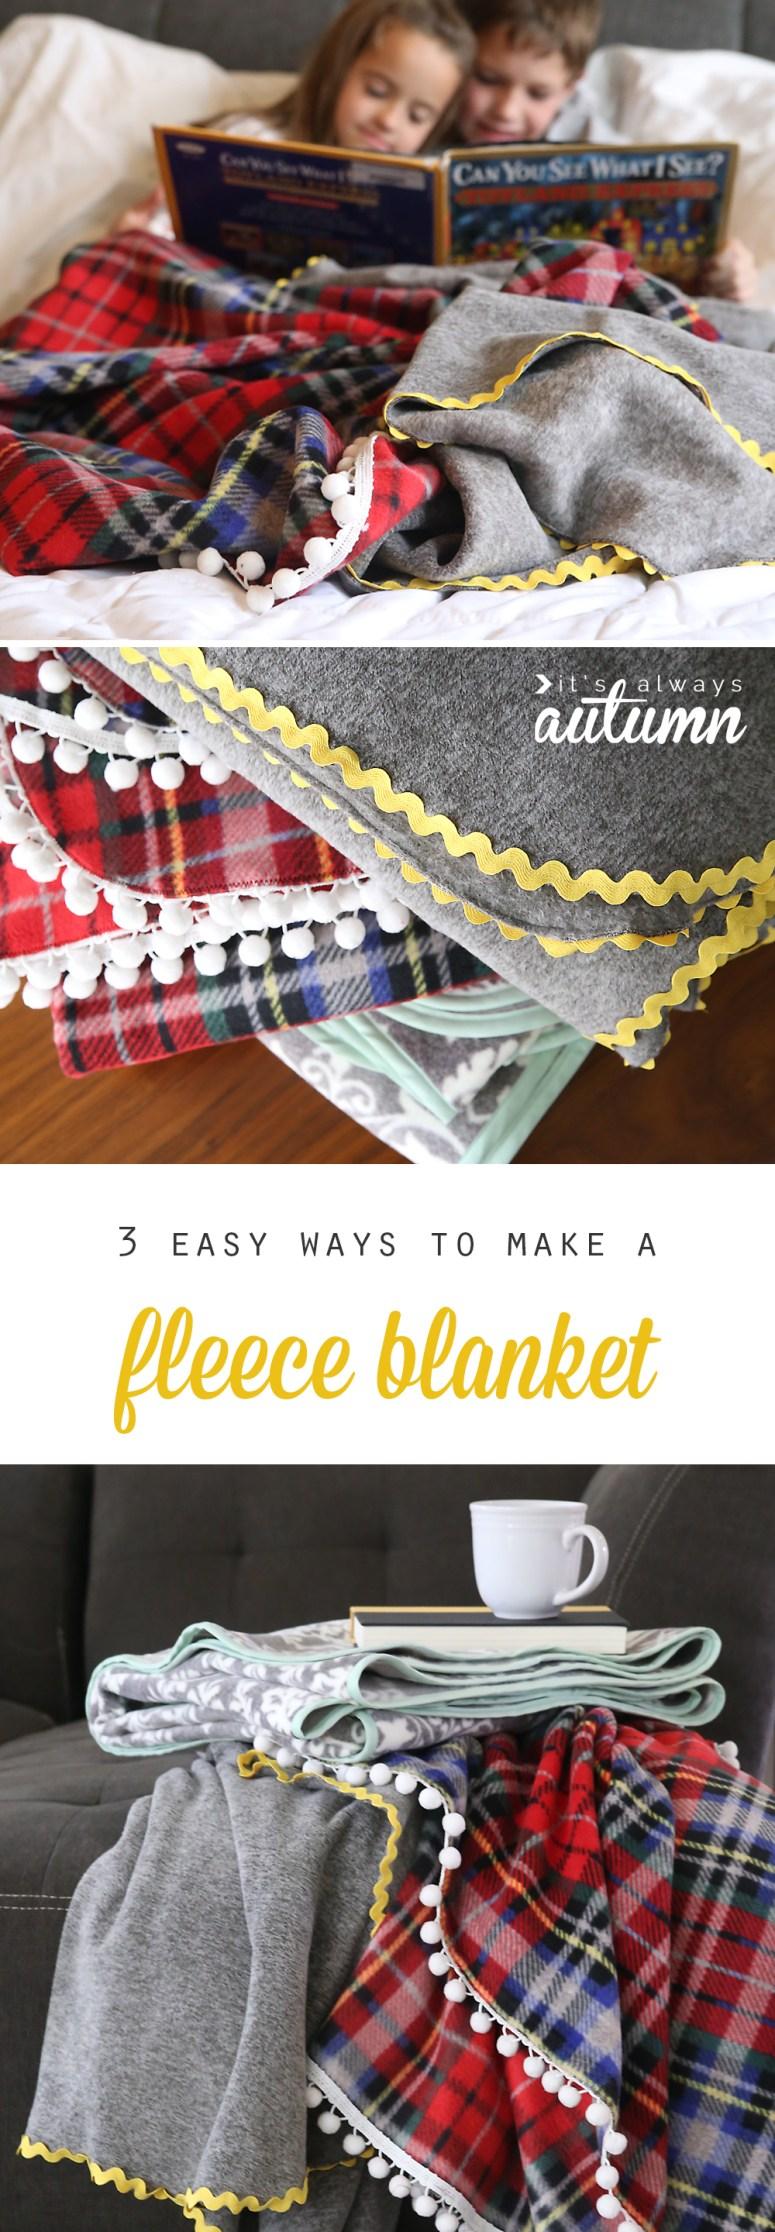 how-to-make-deluxe-fleece-blankets-easy-diy-handmade-christmas-gift-guys-sew-pinnable (1)